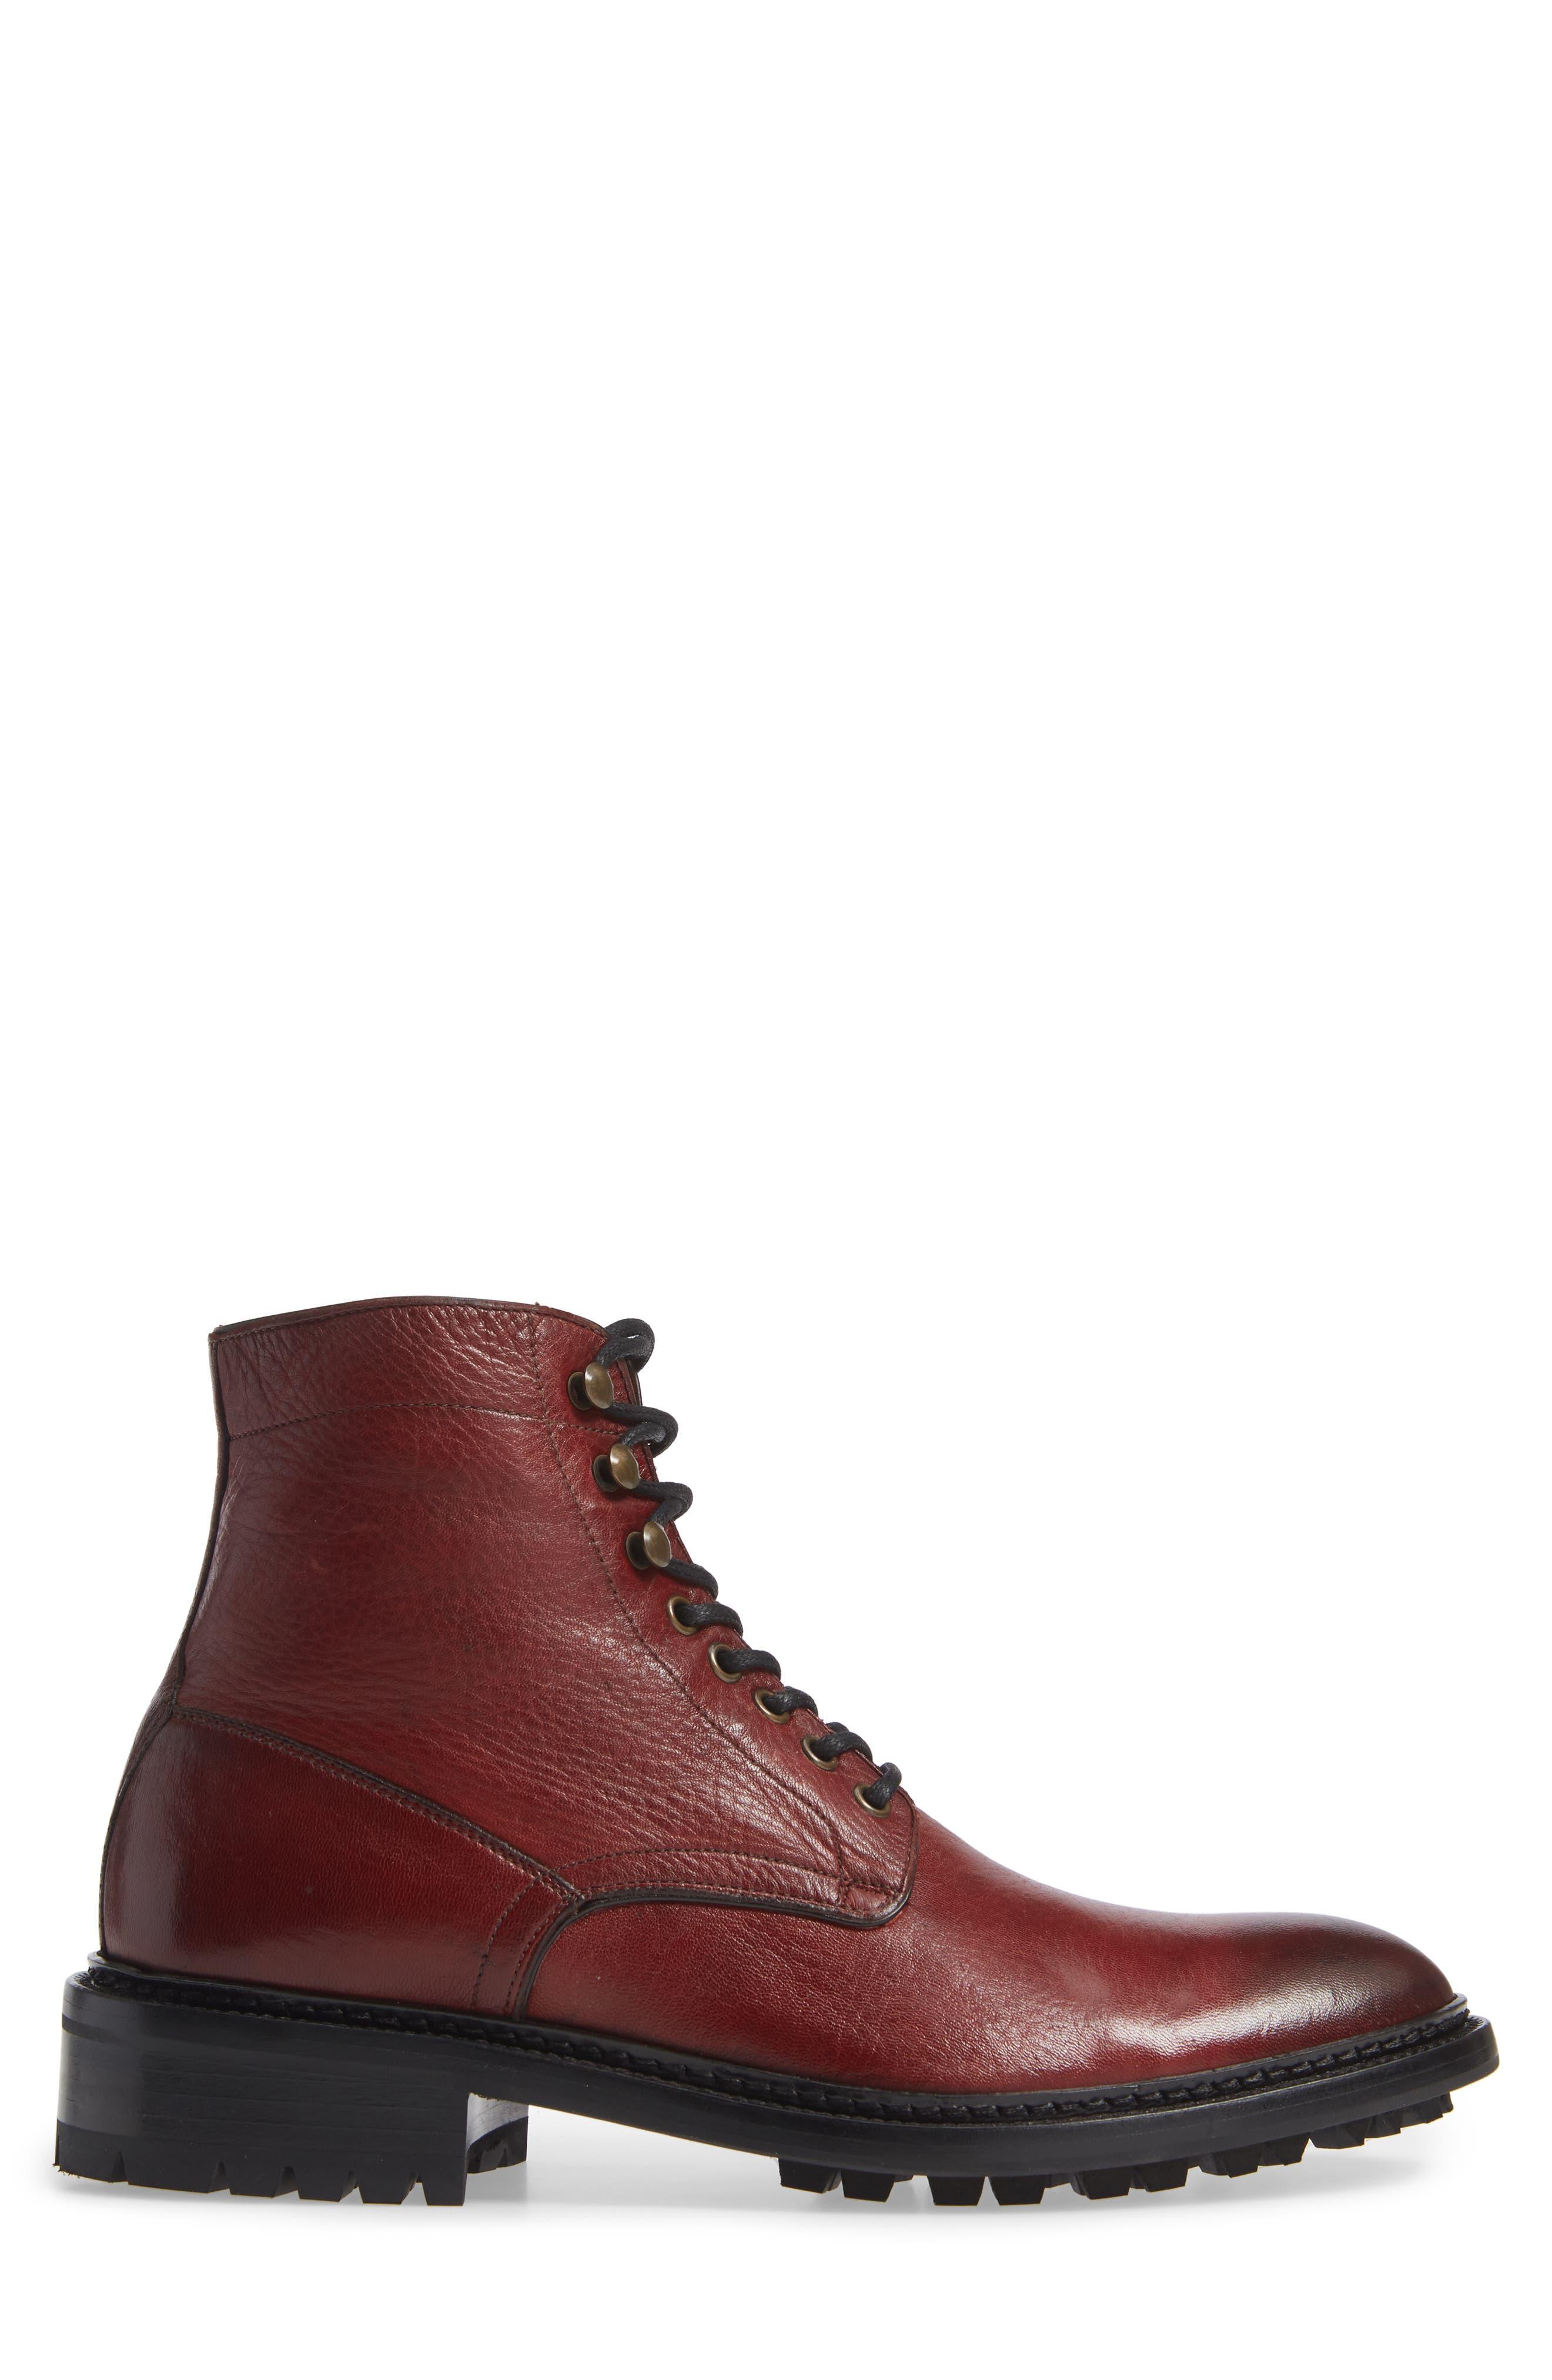 Greyson Plain Toe Boot,                             Alternate thumbnail 3, color,                             BURGUNDY